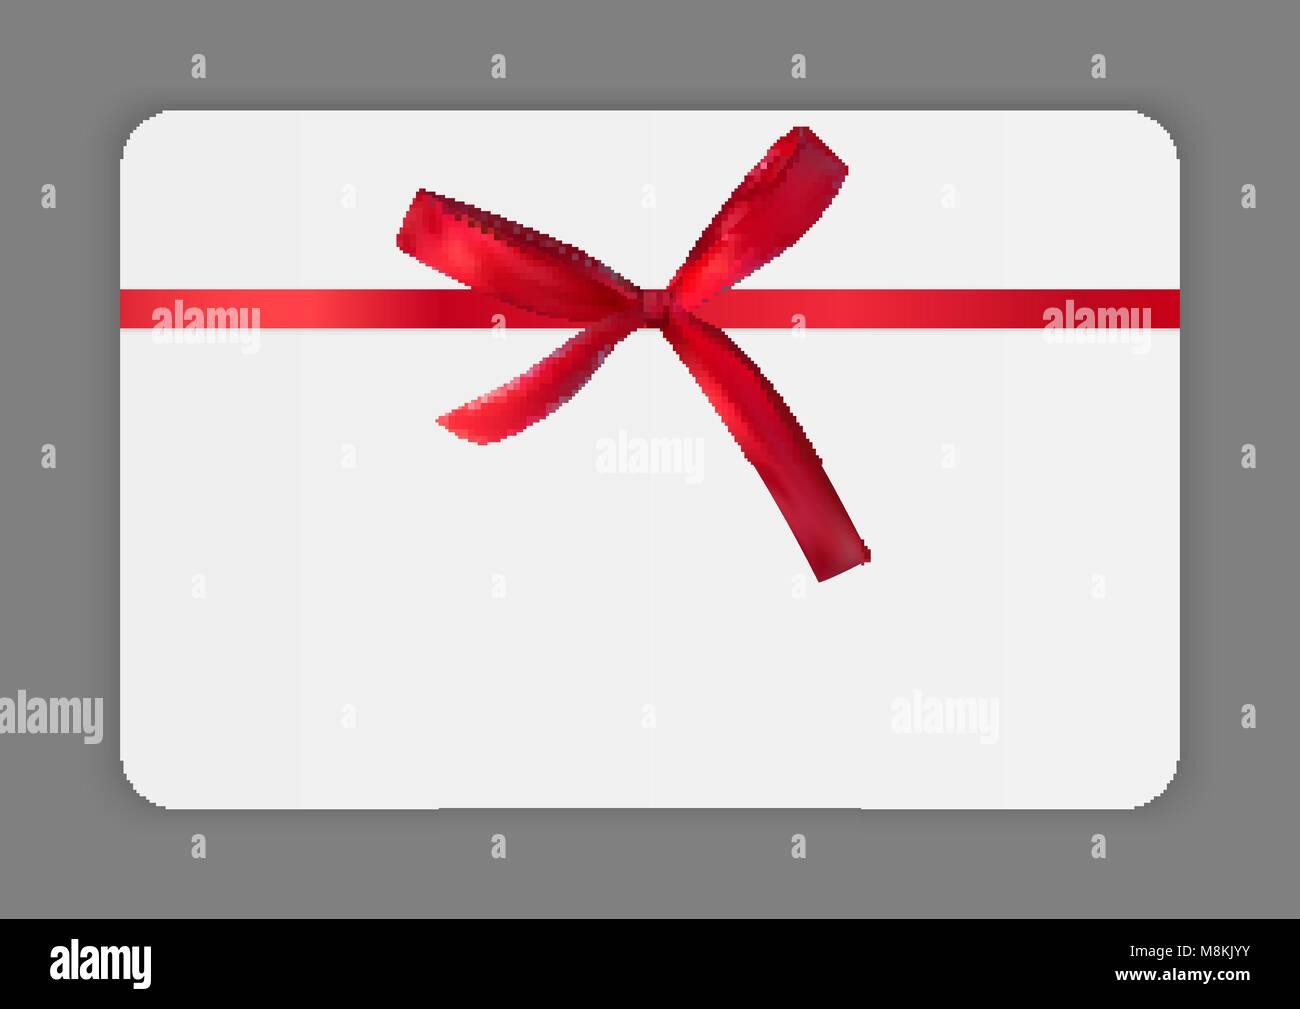 Promo Certificate Stockfotos & Promo Certificate Bilder - Alamy